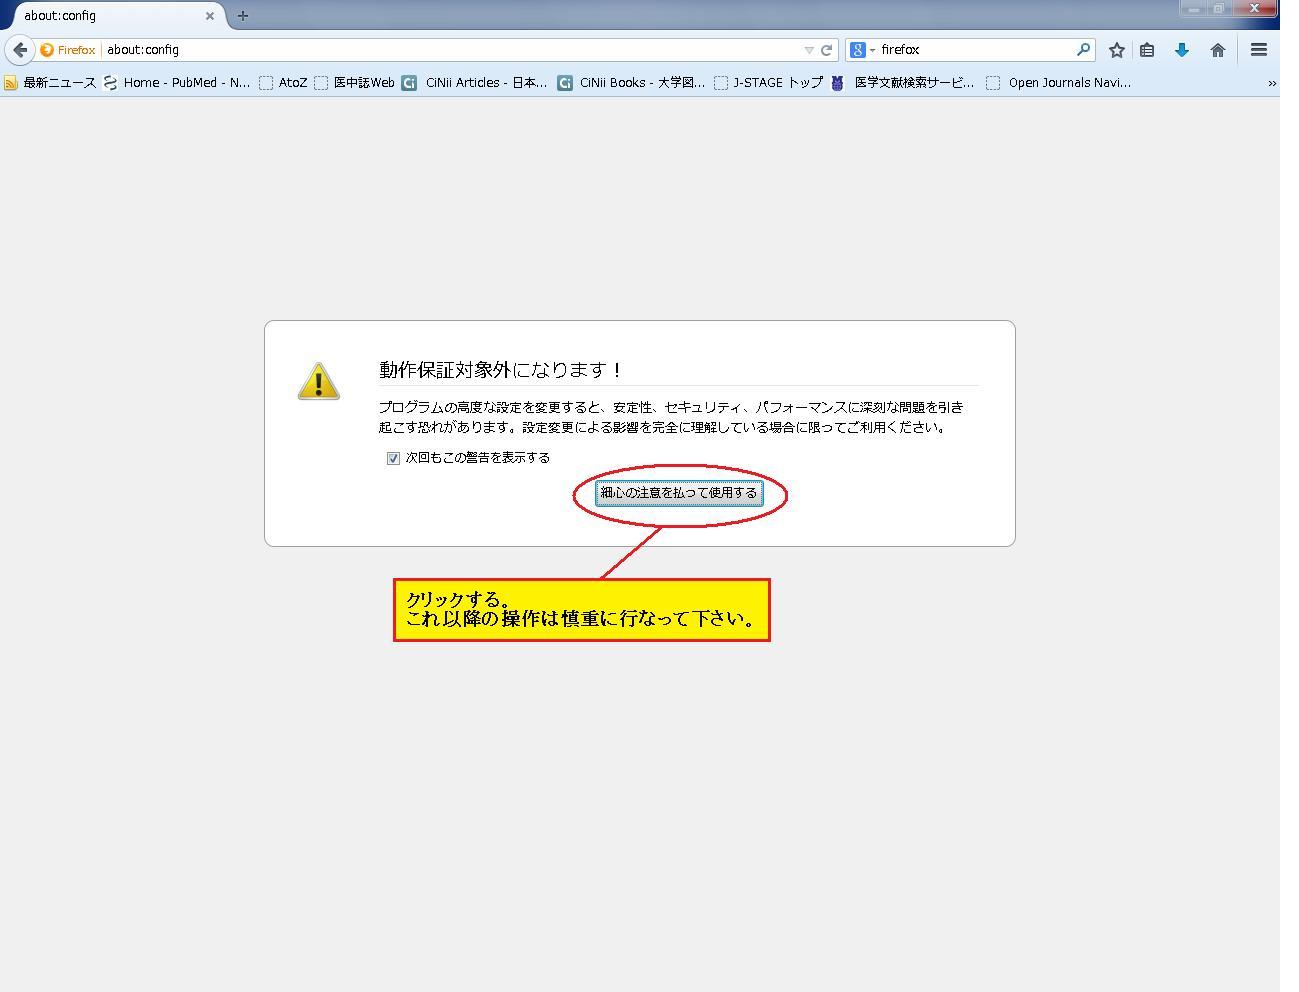 http://www.shinshu-u.ac.jp/institution/library/medicine/uploadimg/firefoxno2.jpg